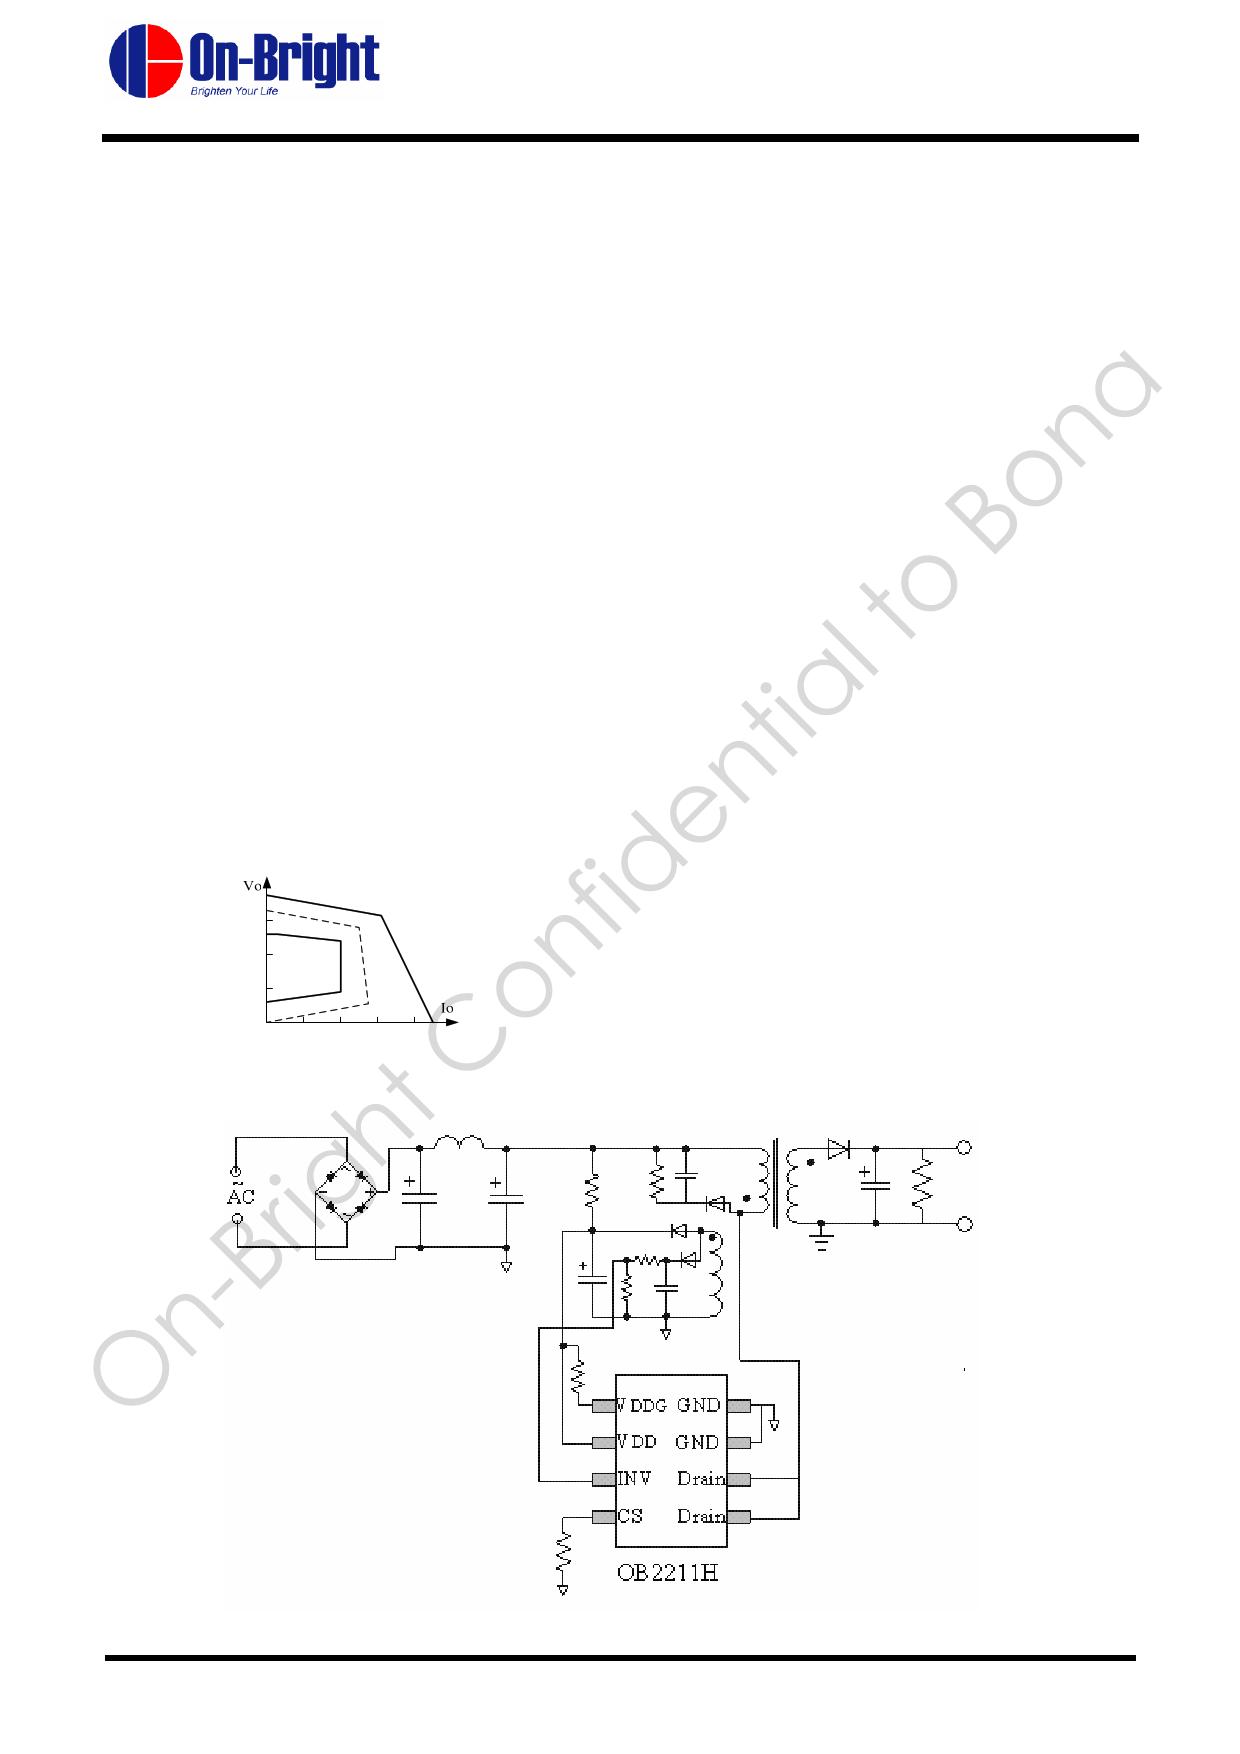 OB2211H datasheet